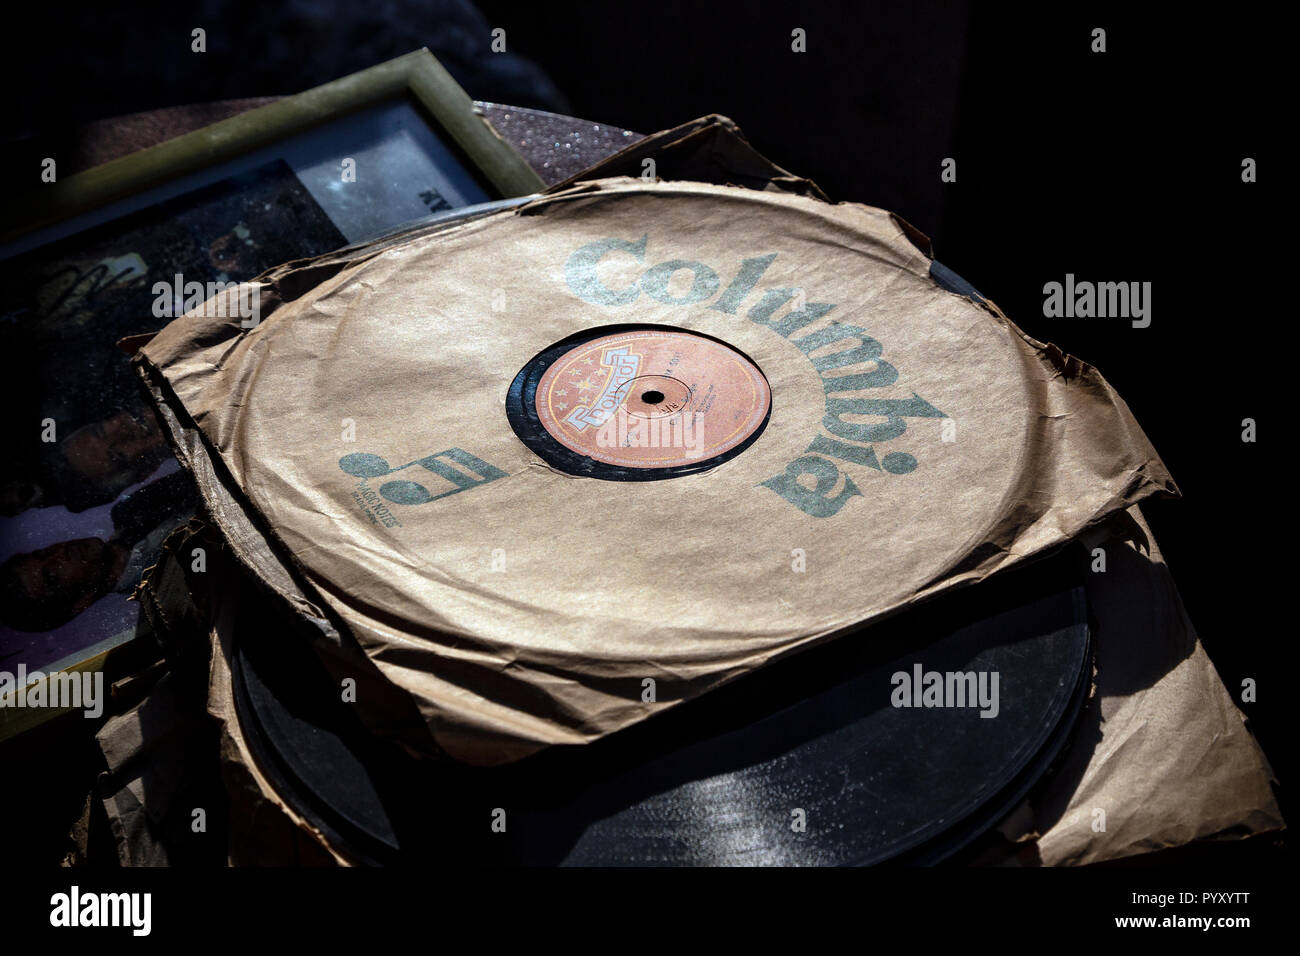 Vinyl Record Cut Out Stock Photos Amp Vinyl Record Cut Out